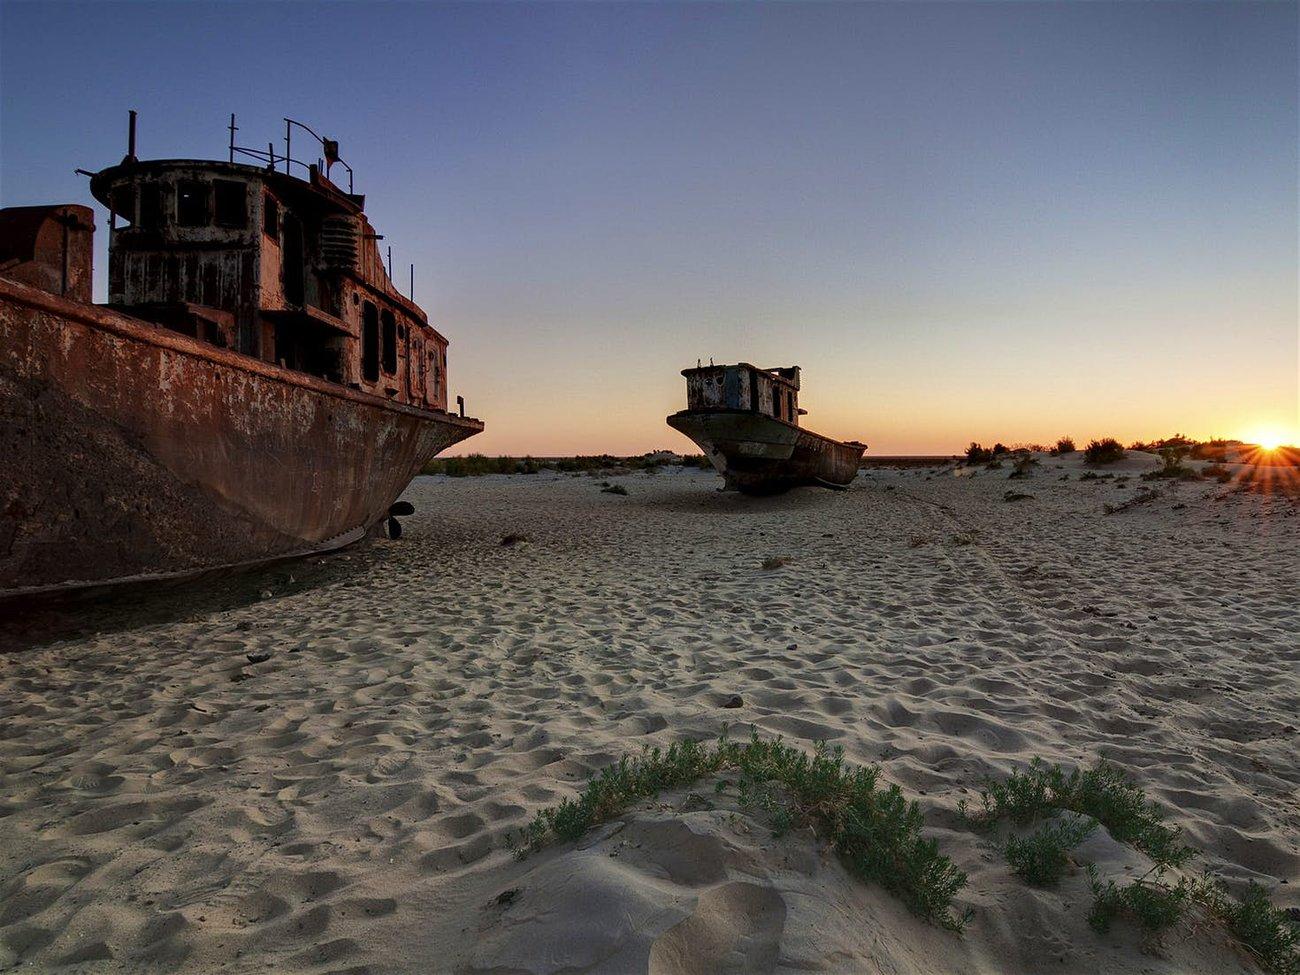 aral-sea-dead-shipyard-8e83fbda2527.jpg